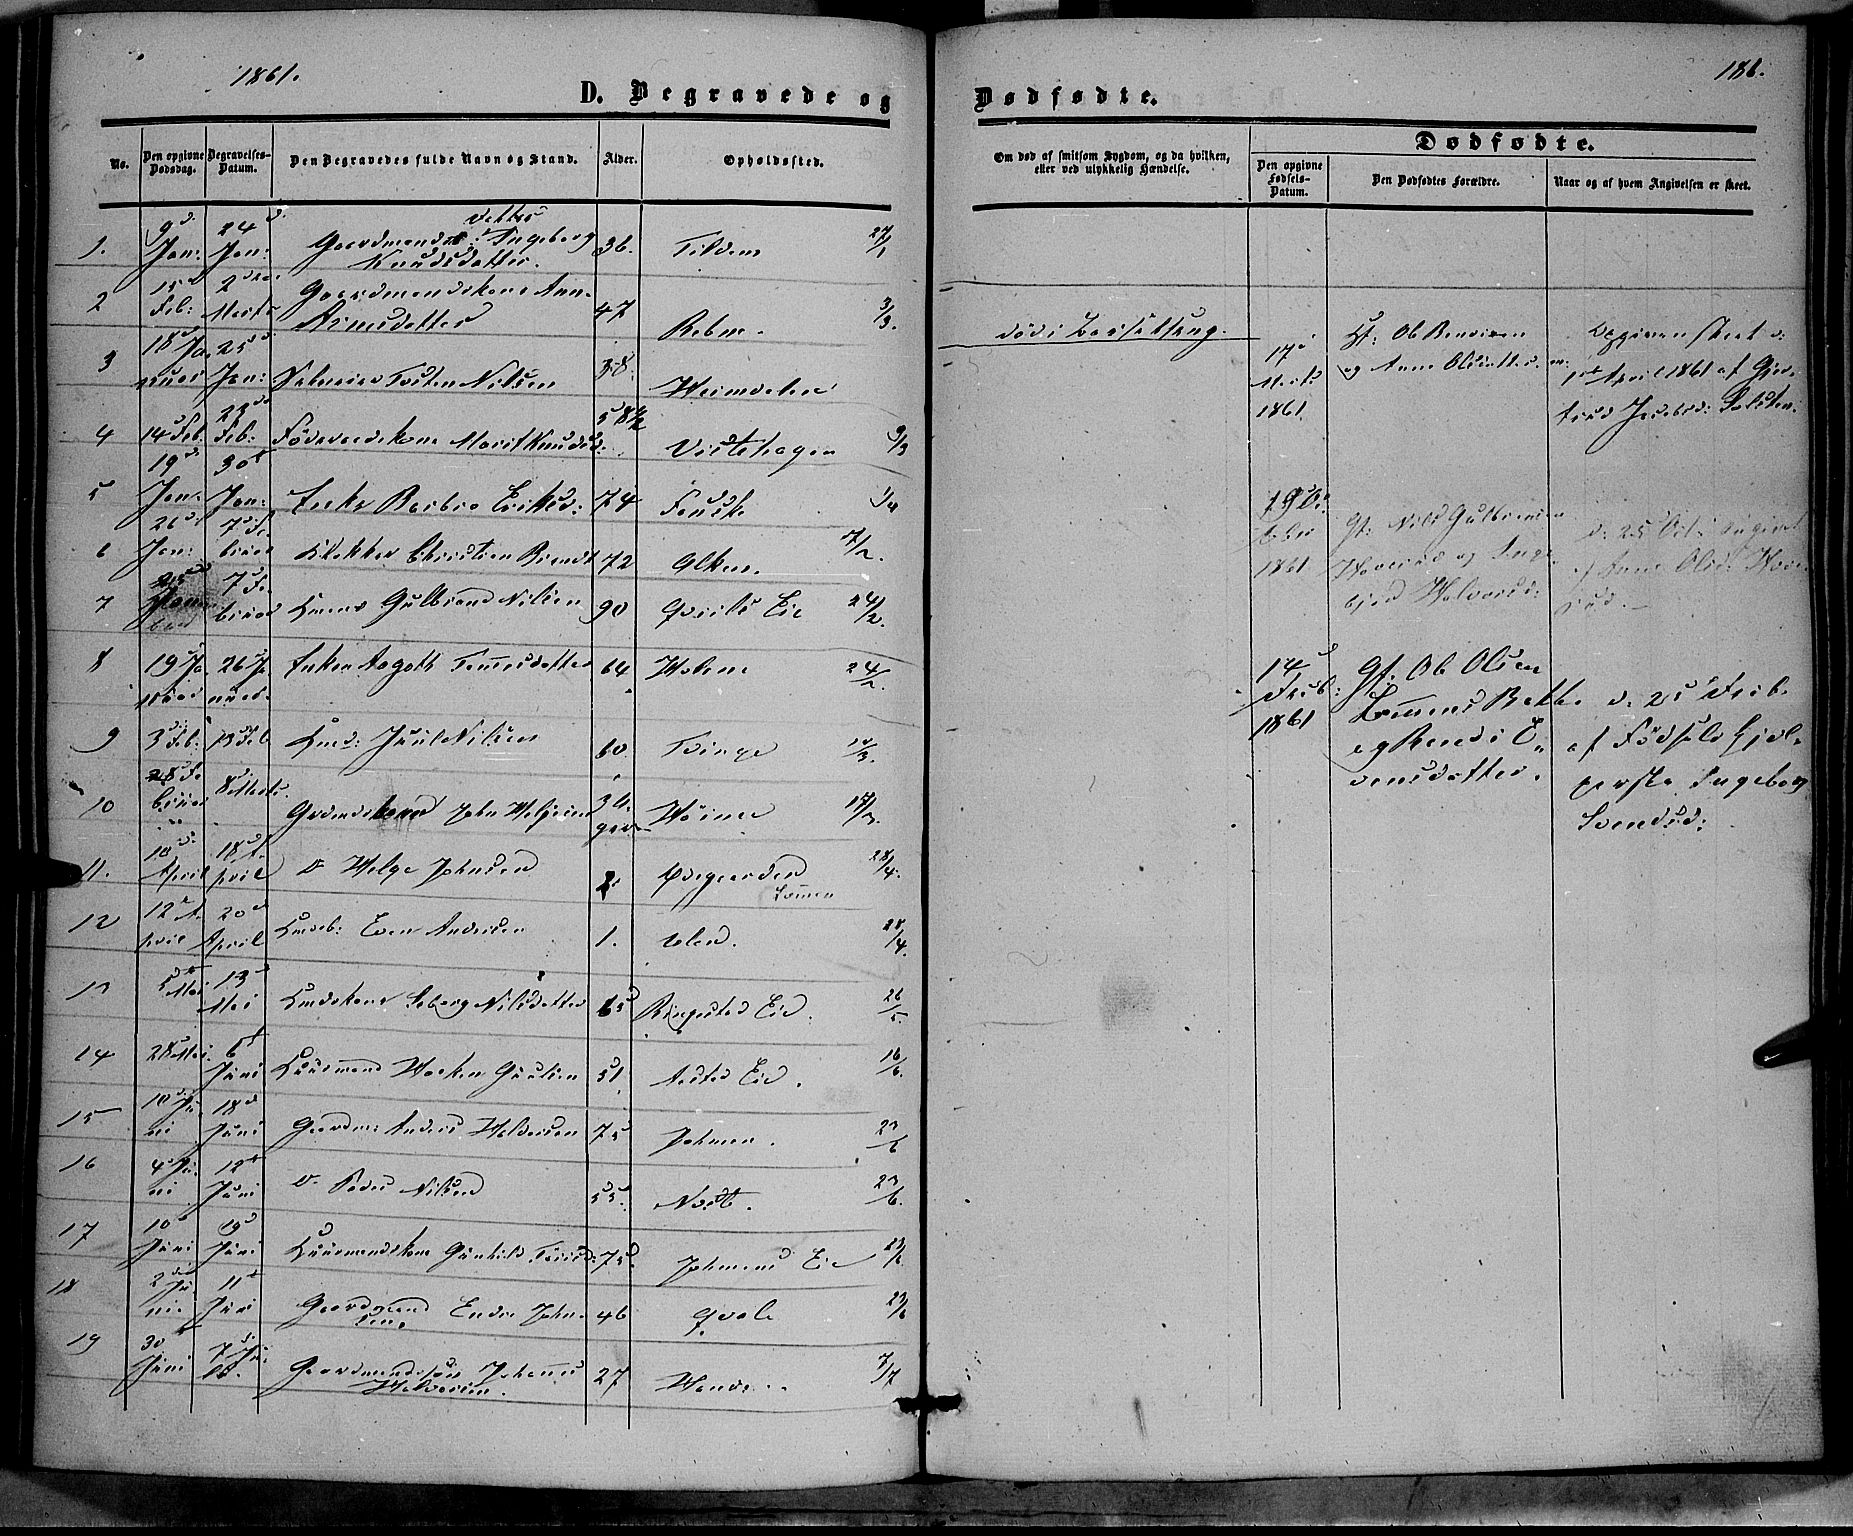 SAH, Vestre Slidre prestekontor, Ministerialbok nr. 2, 1856-1864, s. 186